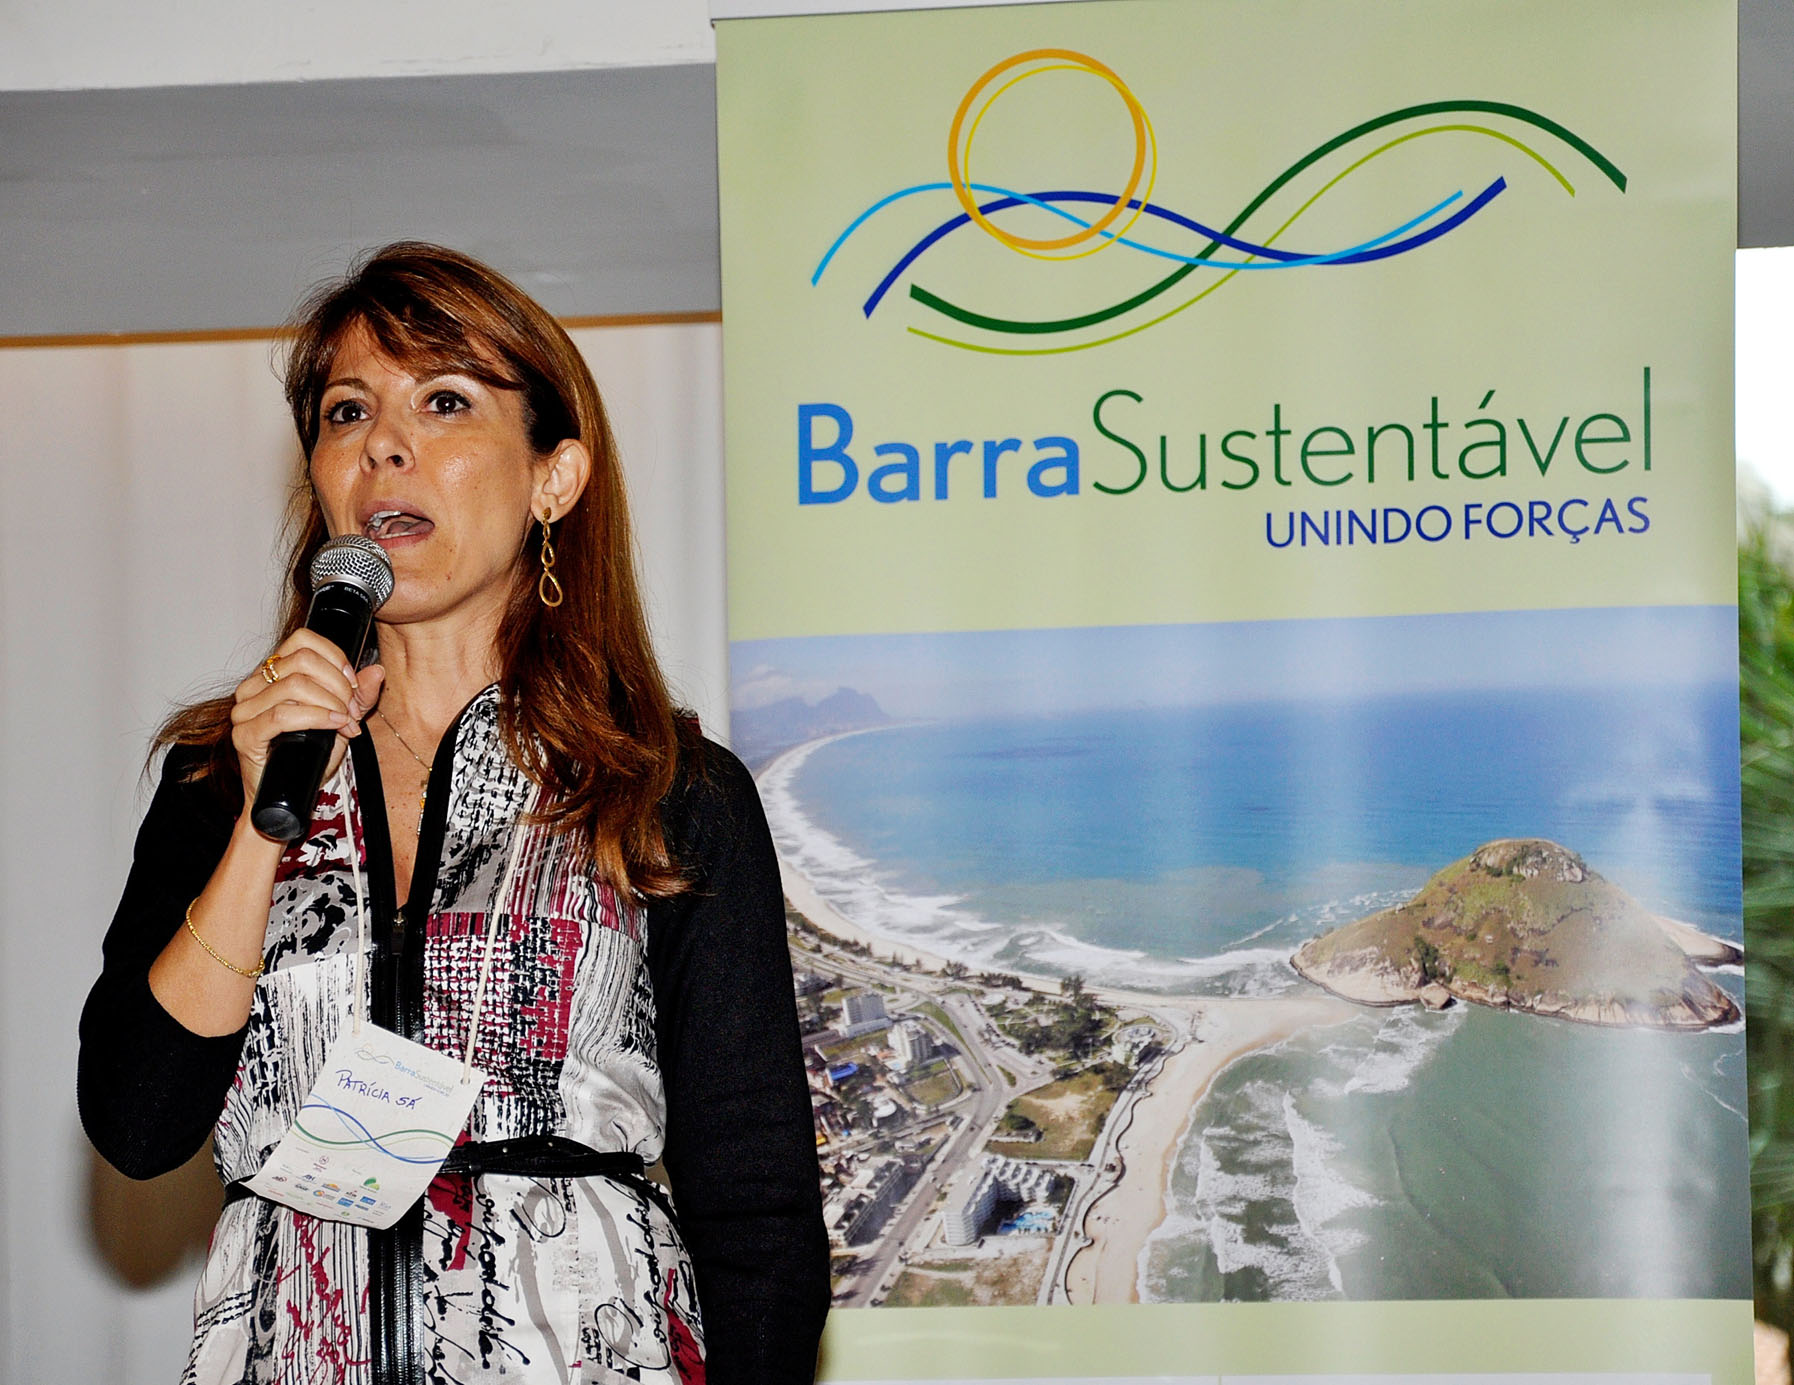 Barra_Sustentável_-_23_-_Set_2011_(2)-001